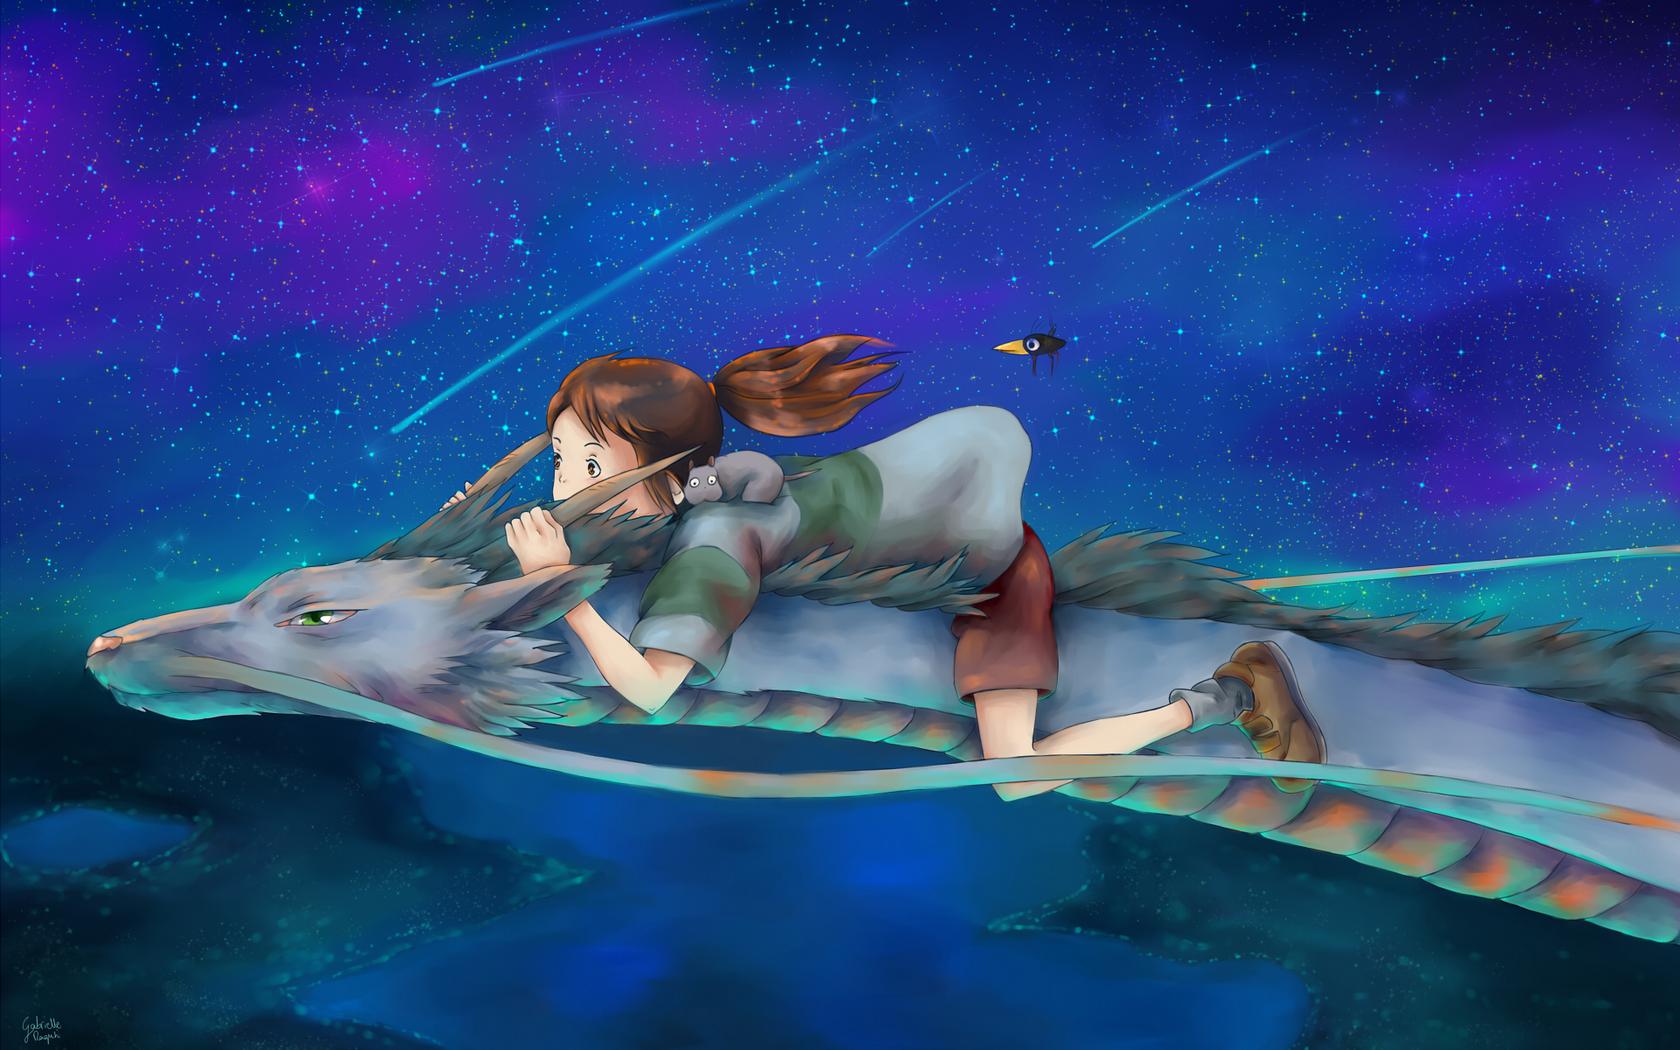 Spirited Away Anime Wallpaper # 7